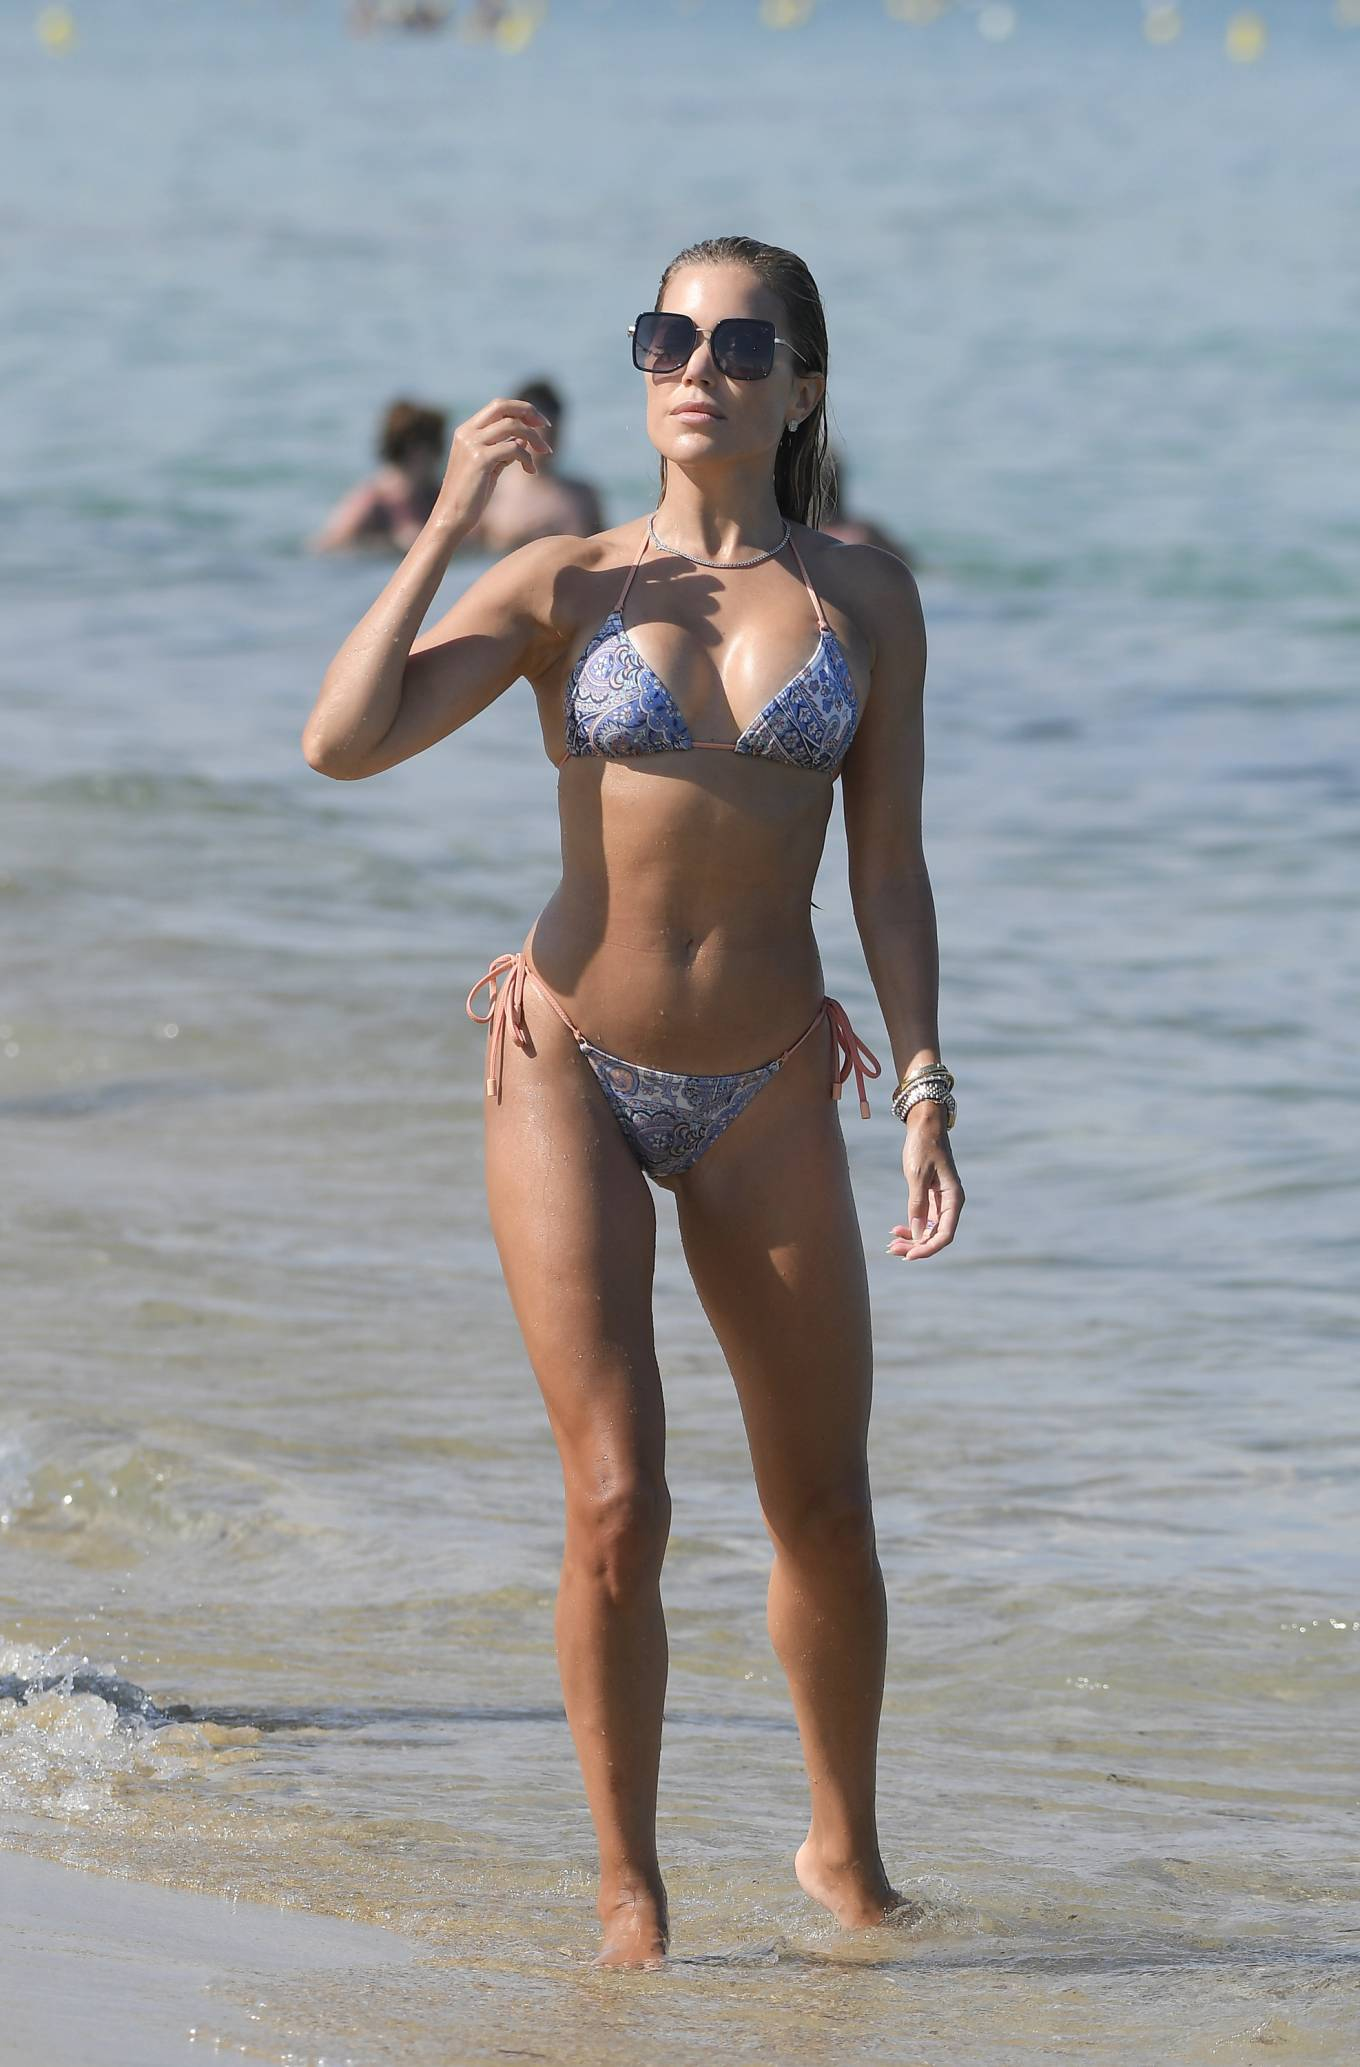 Sylvie Meis 2021 : Sylvie Meis – In a bikini with her husband Niclas Castello on the beach La Réserve in Ramatuelle-23